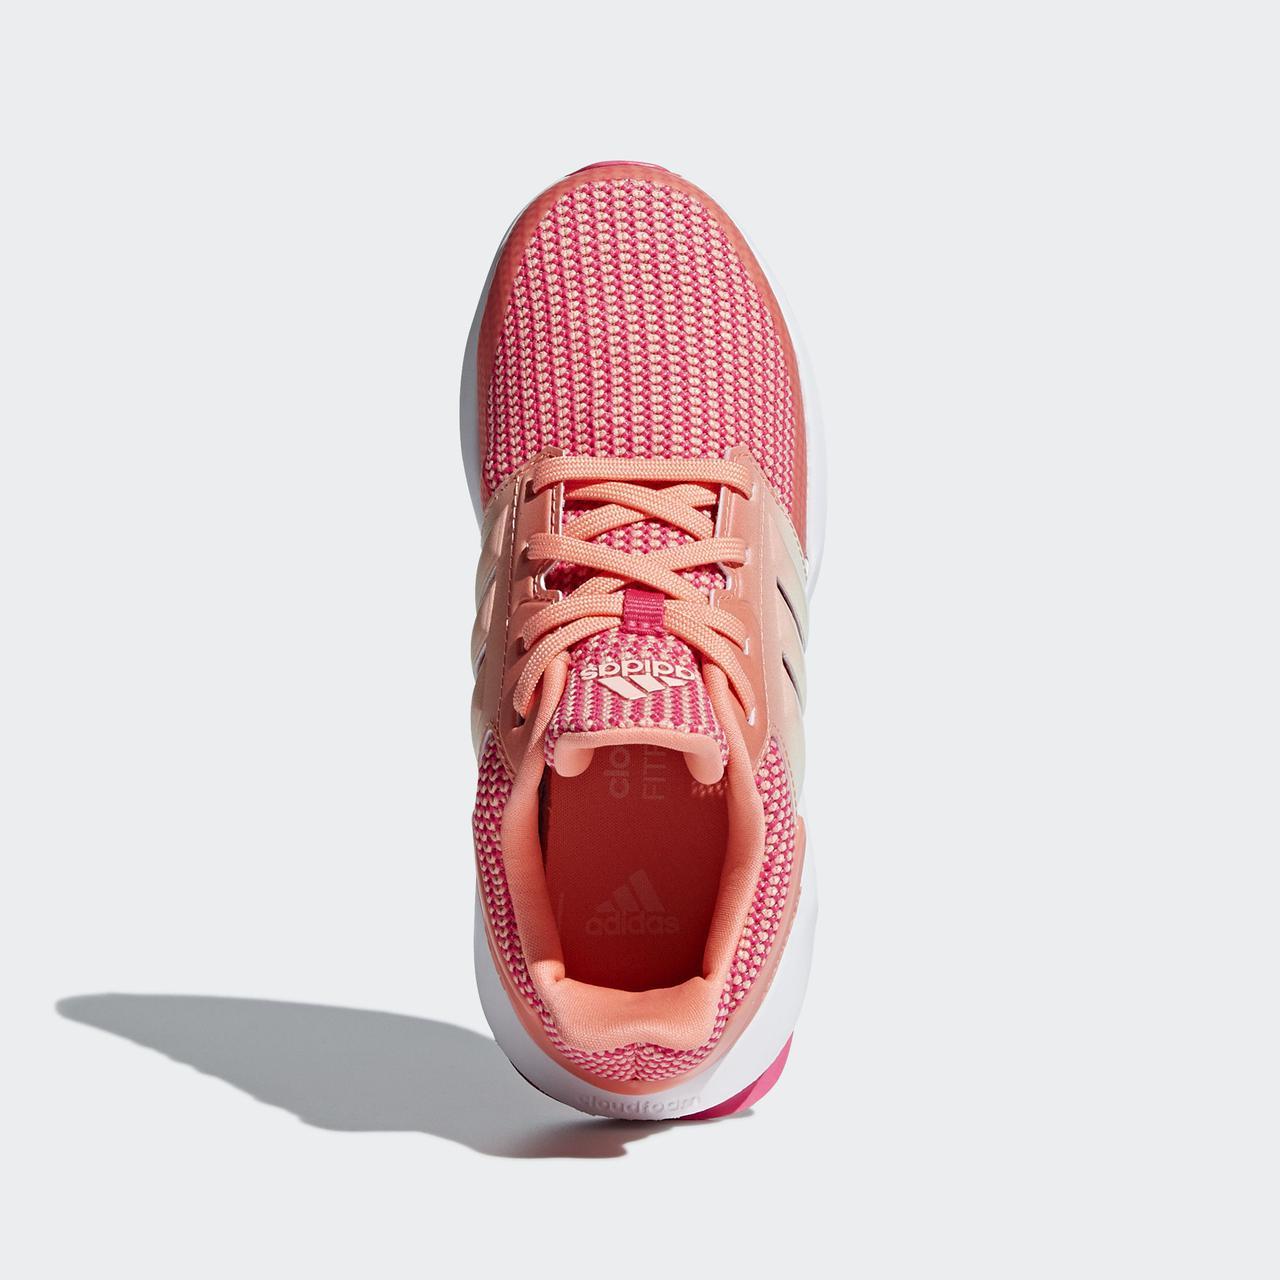 00e91dce89c5 Детские кроссовки Adidas Performance Rapidarun (Артикул  AH2391), ...